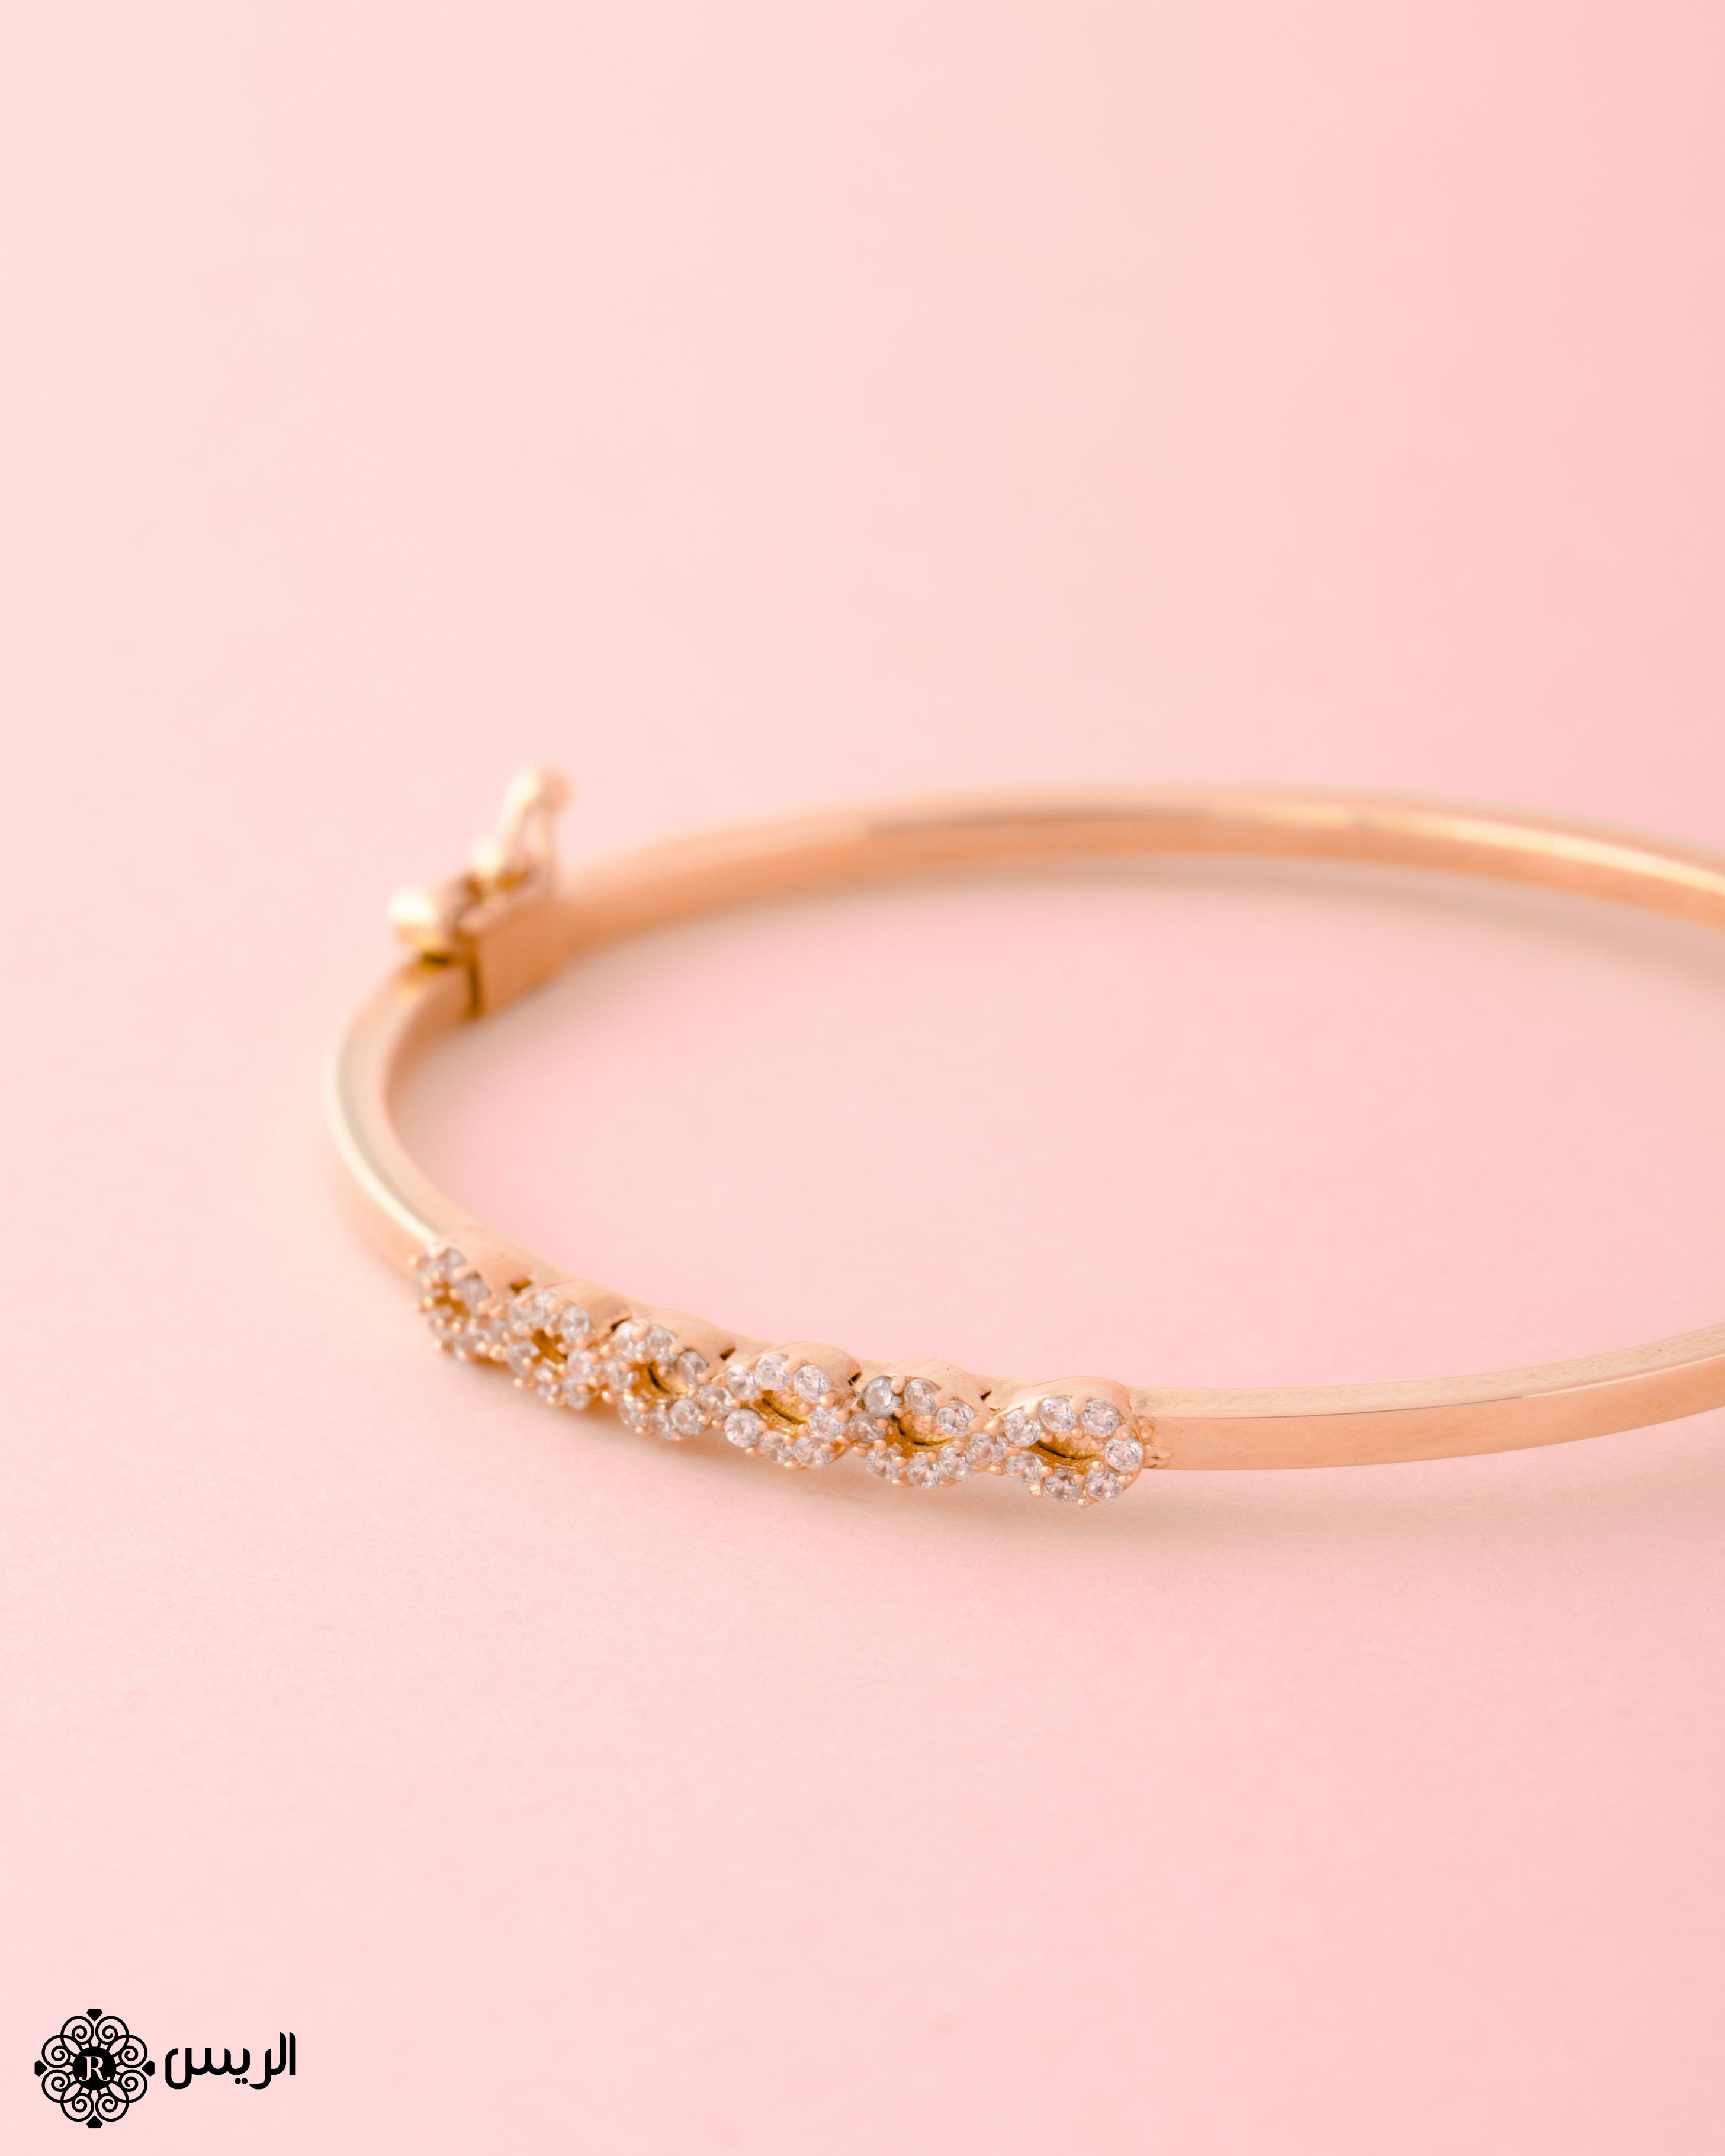 Raies jewelry Kids Bangle Classic إسورة أطفال كلاسيكي الريس للمجوهرات